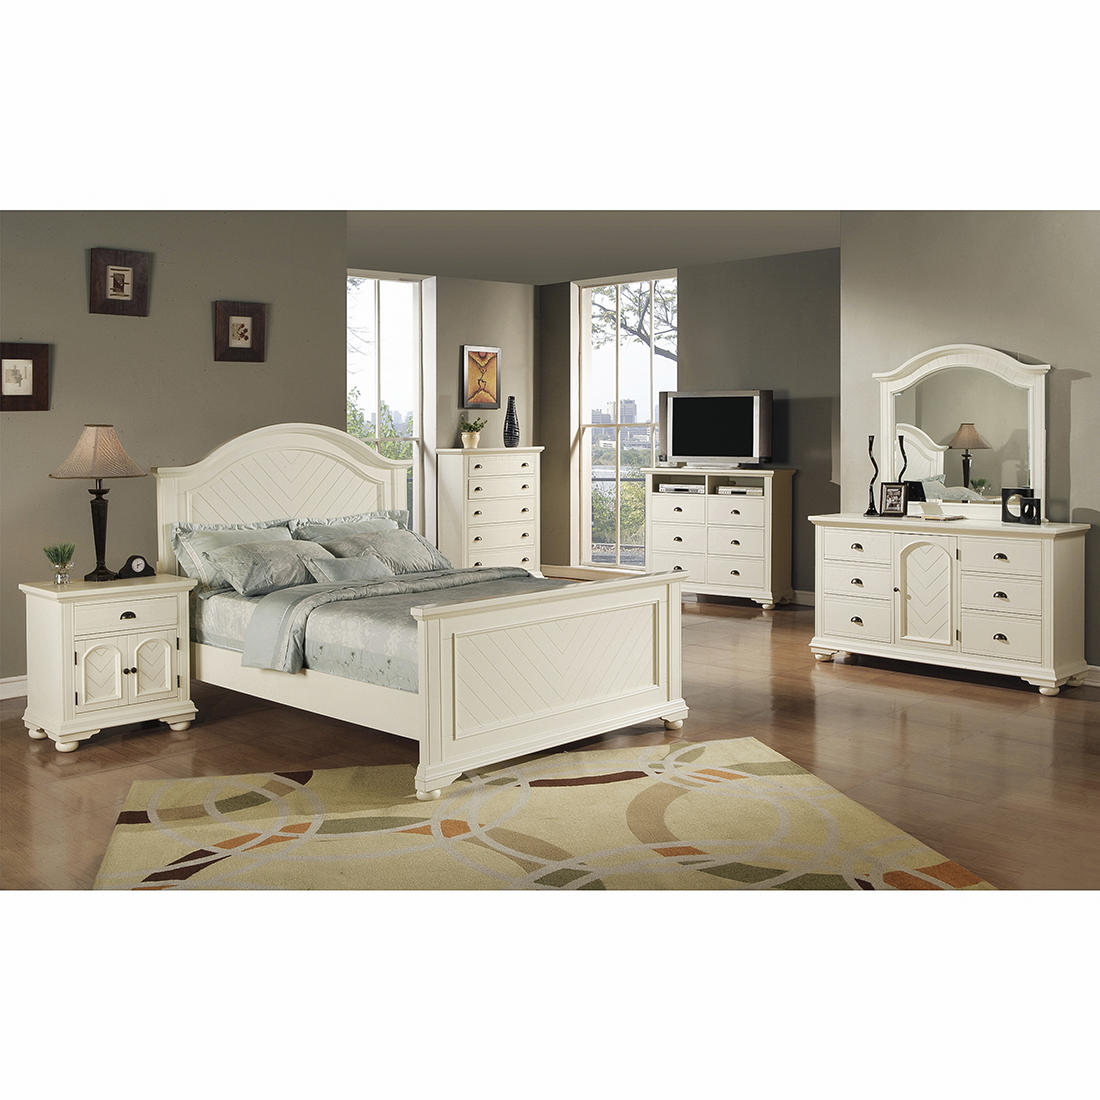 Chadwick 5 Pc Queen Size Panel Bedroom Set Cottage White Bjs Wholesale Club